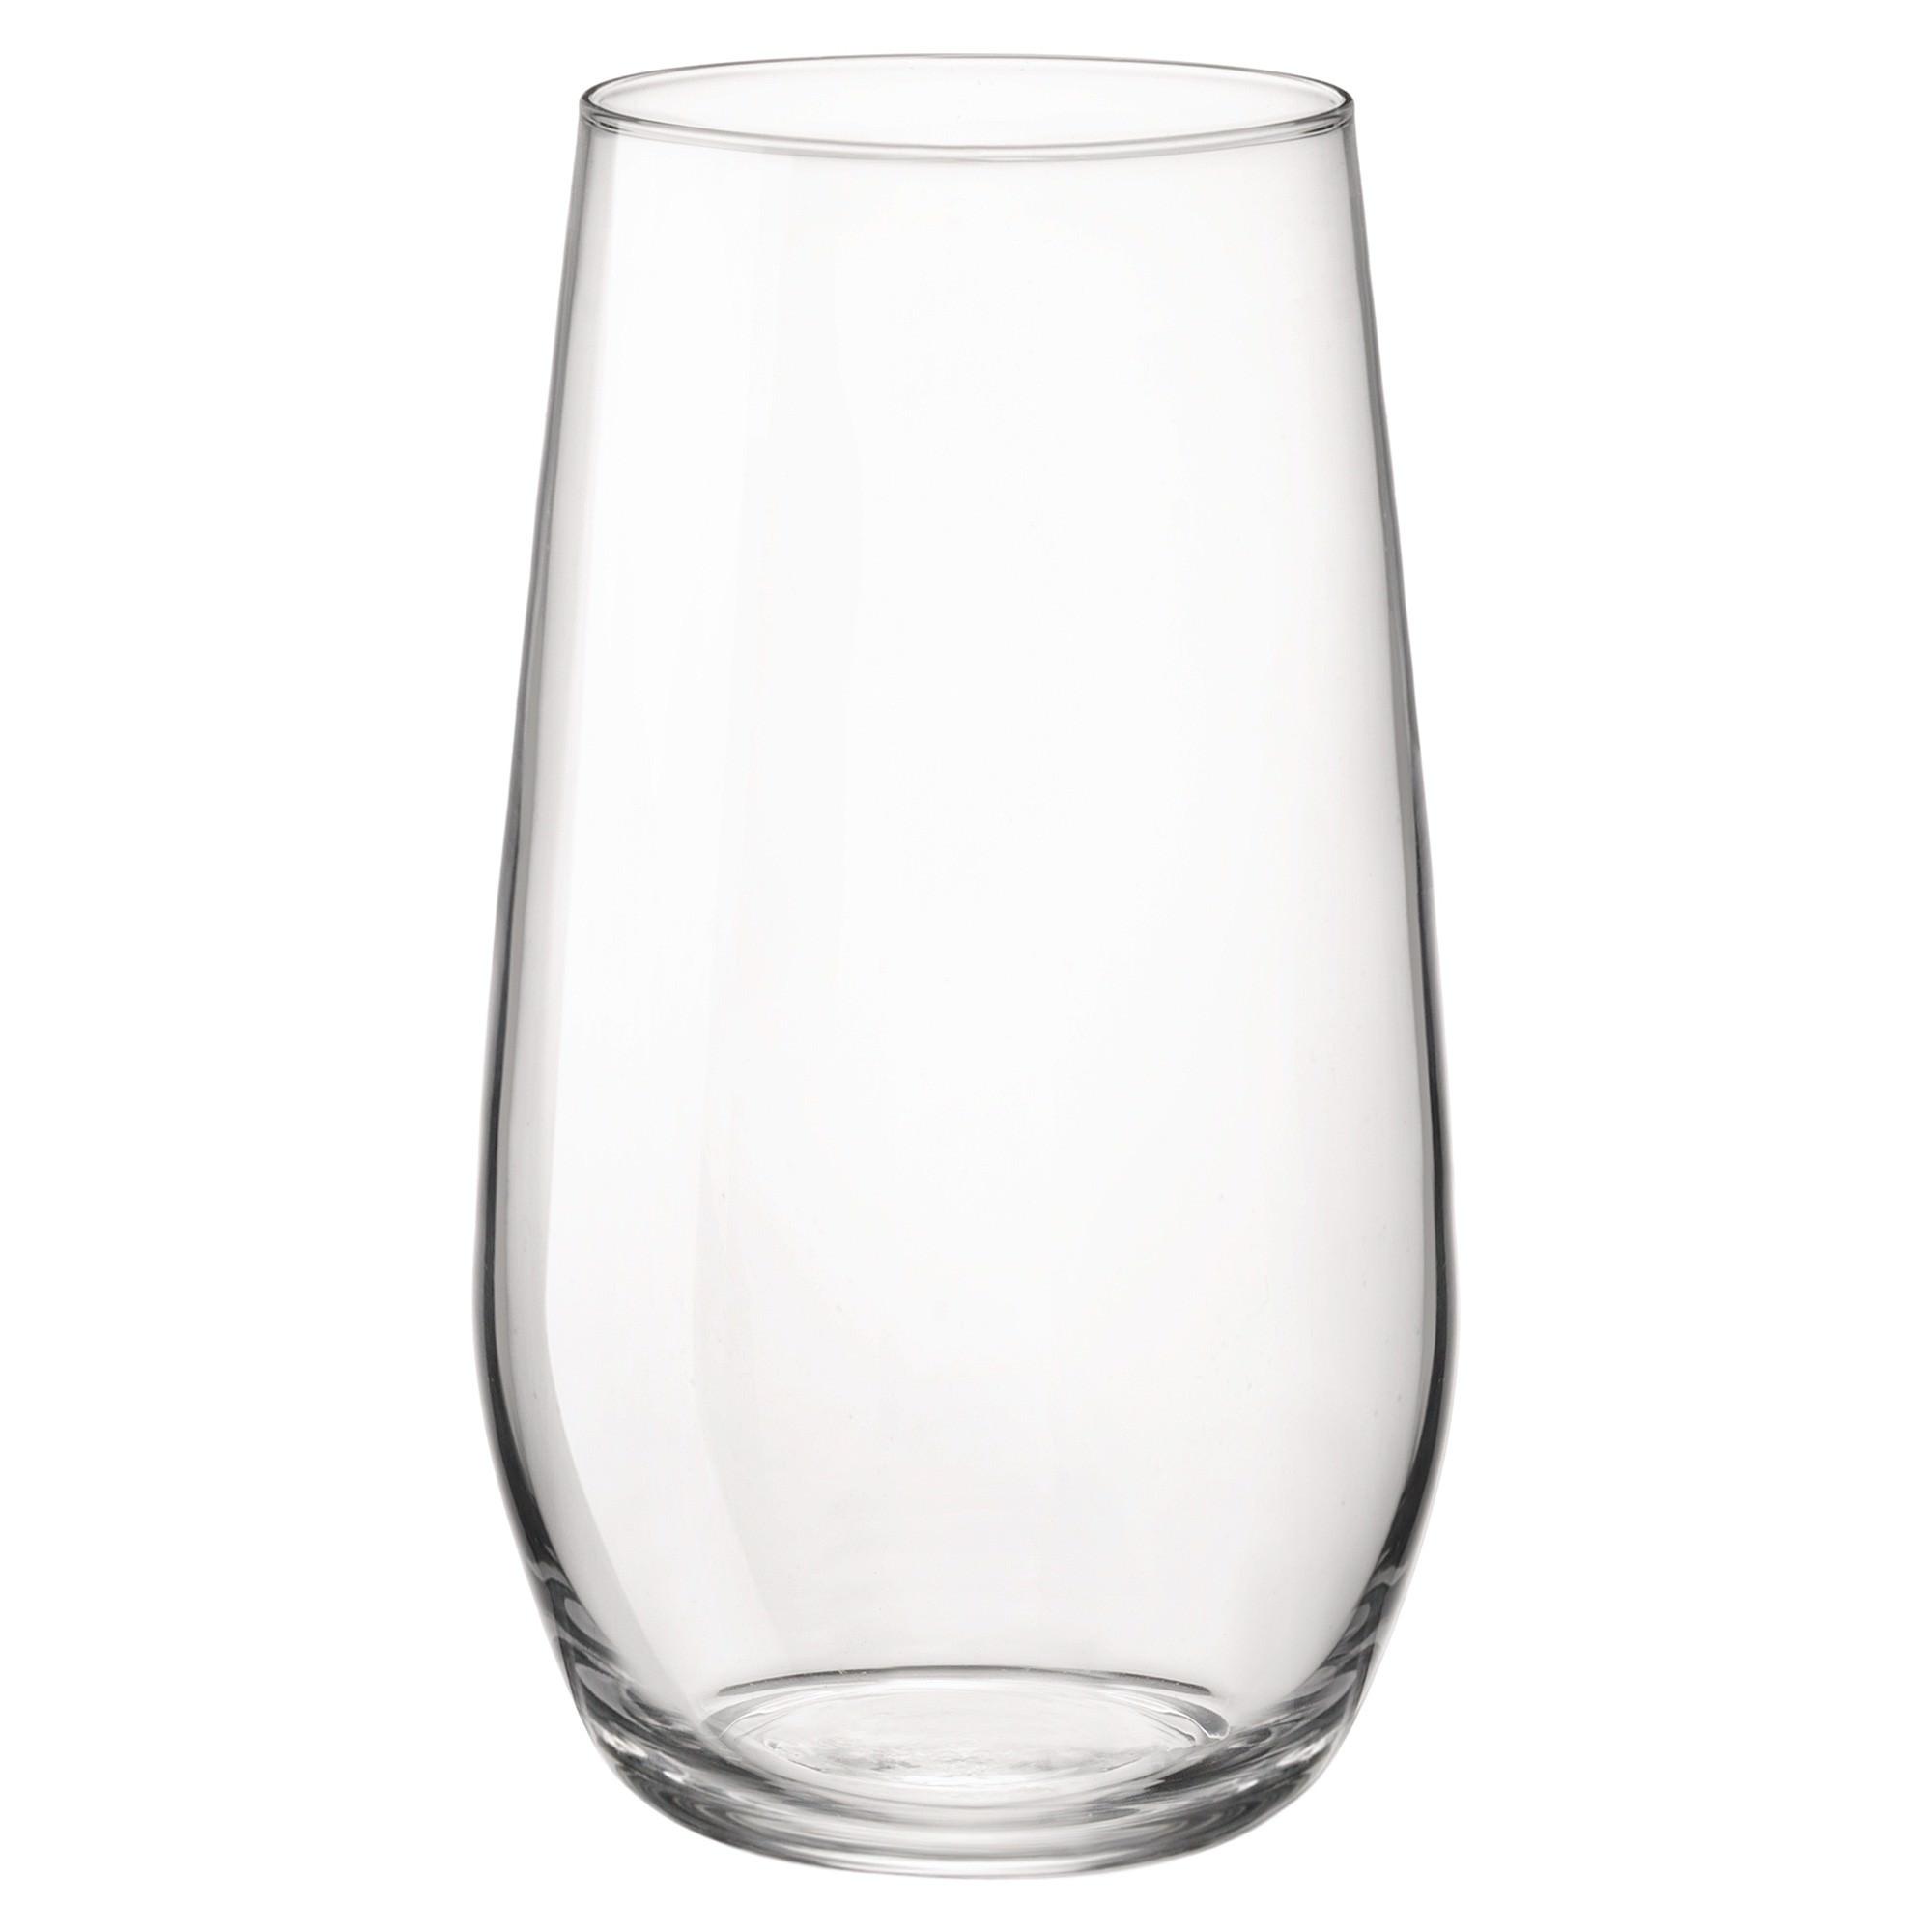 Bormioli Rocco Electra High Ball Glasses, Set of 6